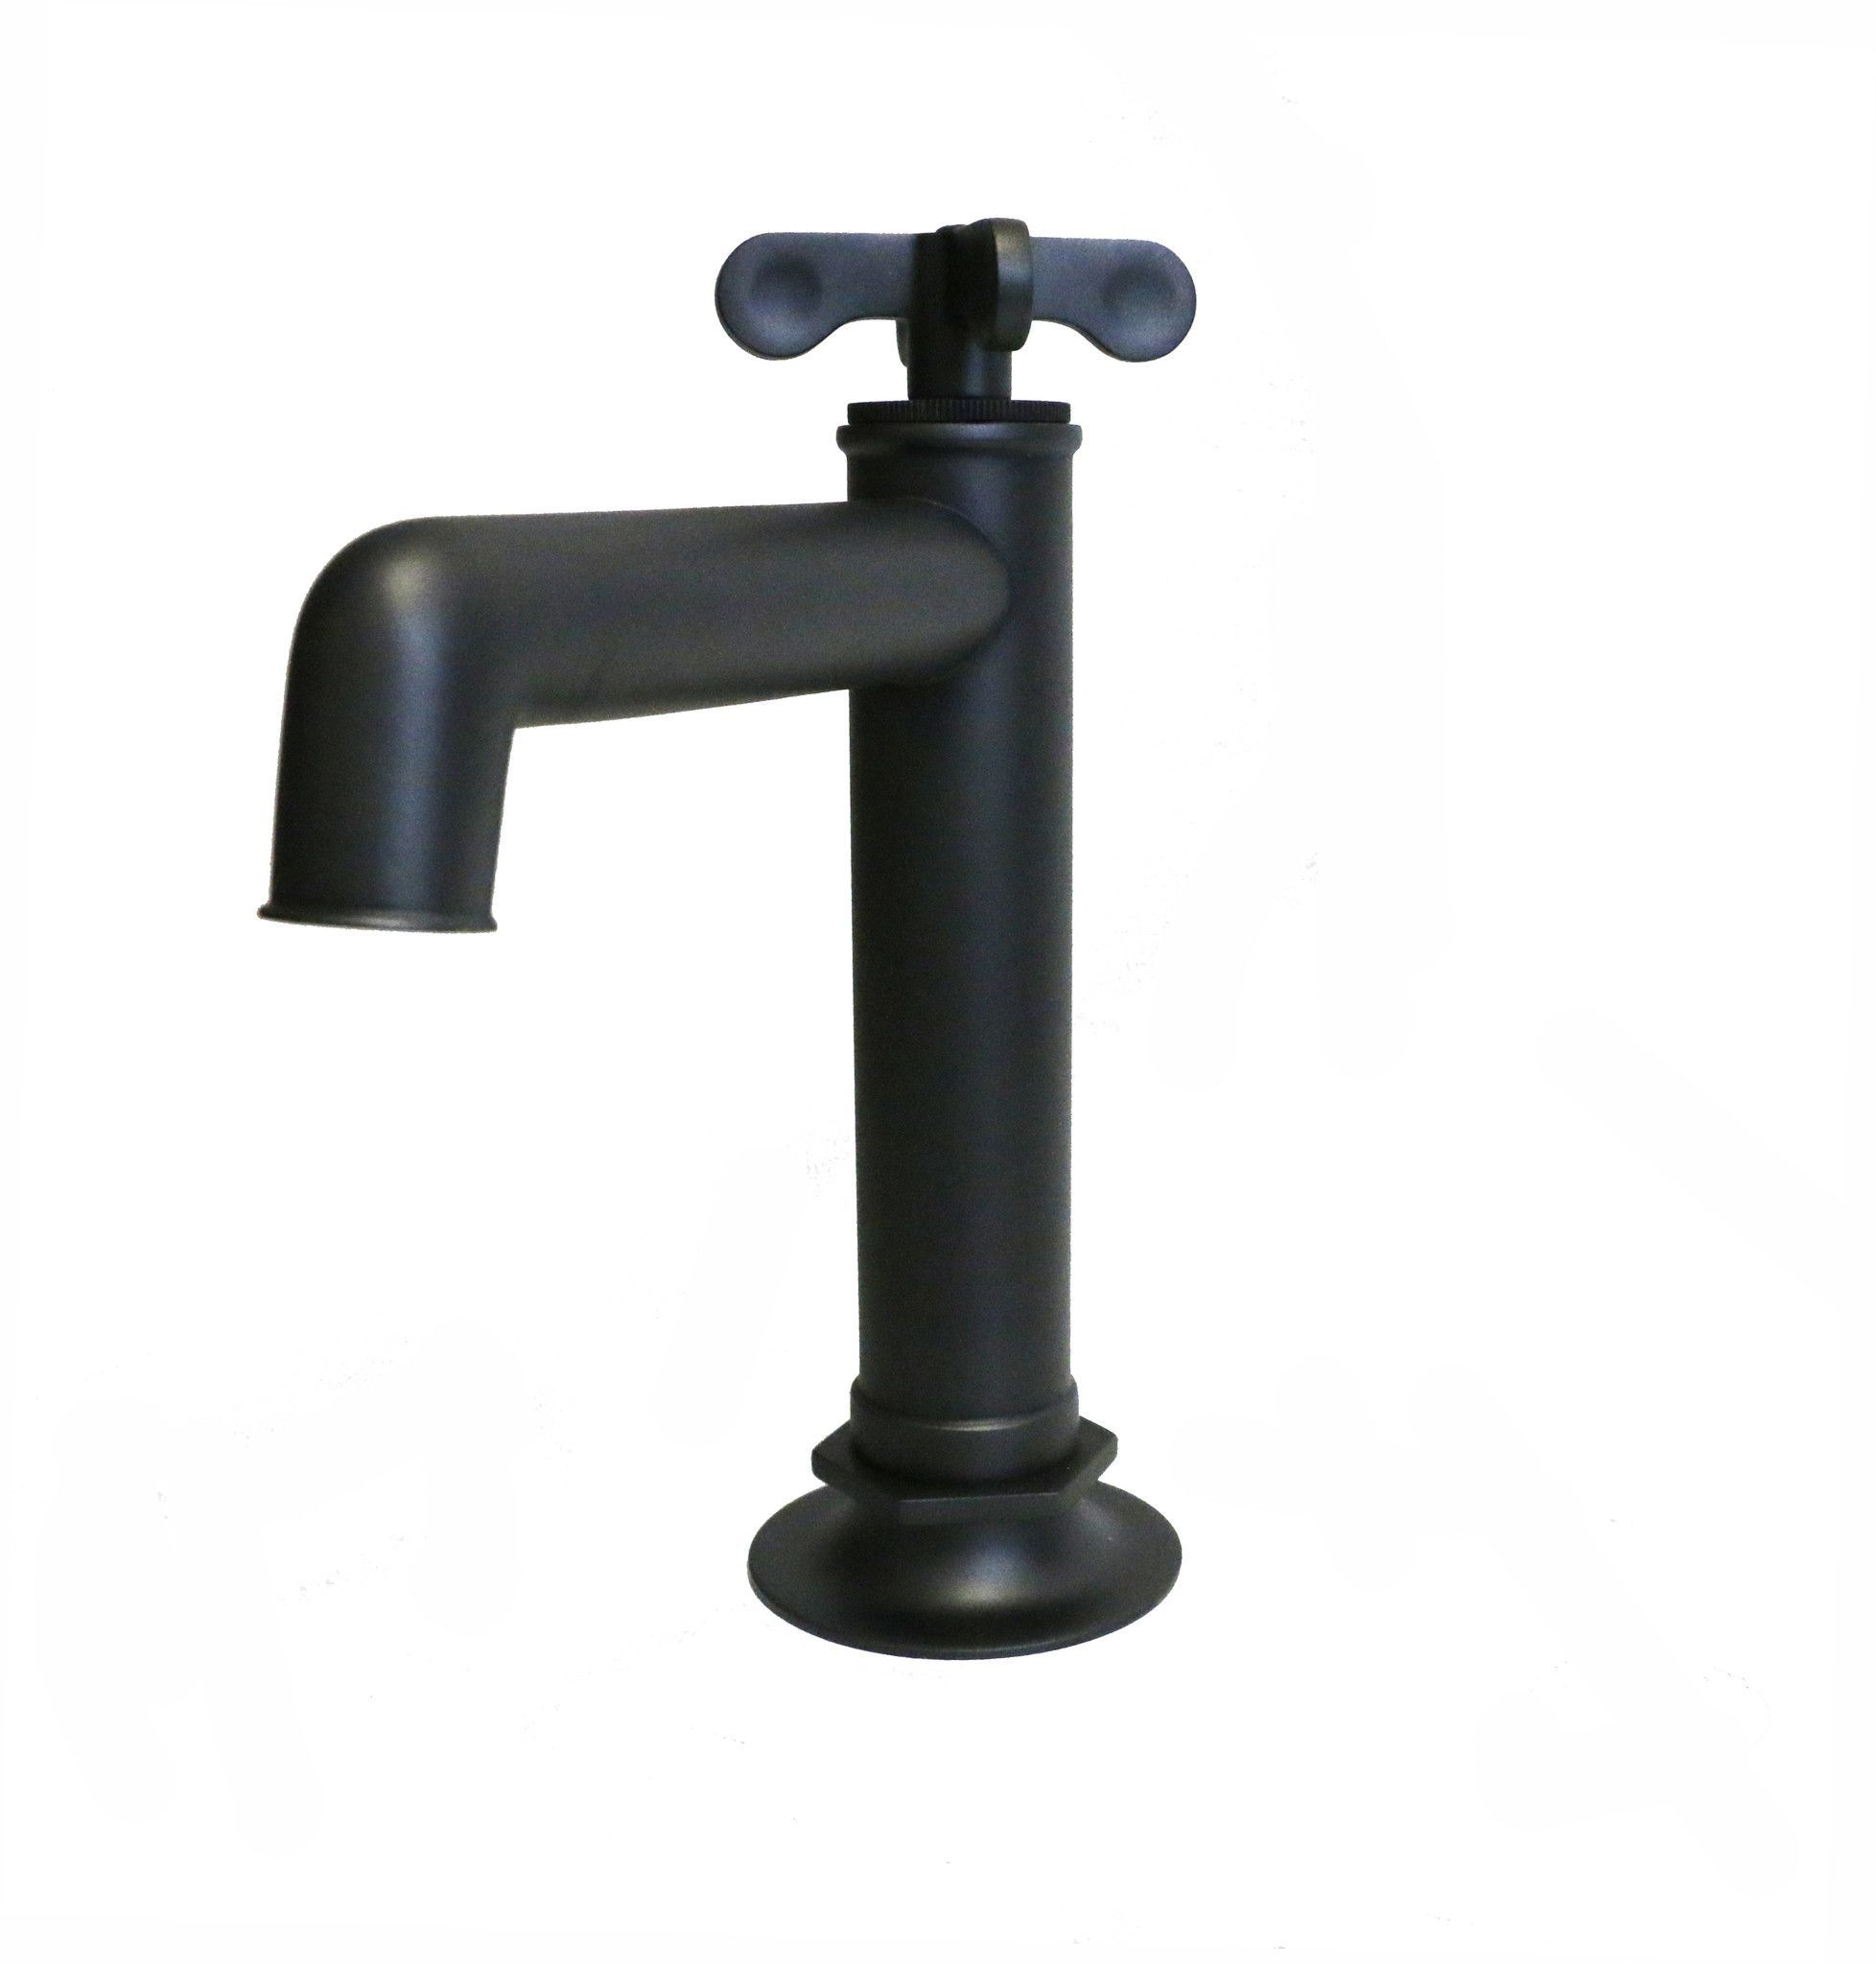 Waterworks Henry Bar Faucet in Oil Rubbed Bronze | Waterworks, Bar ...